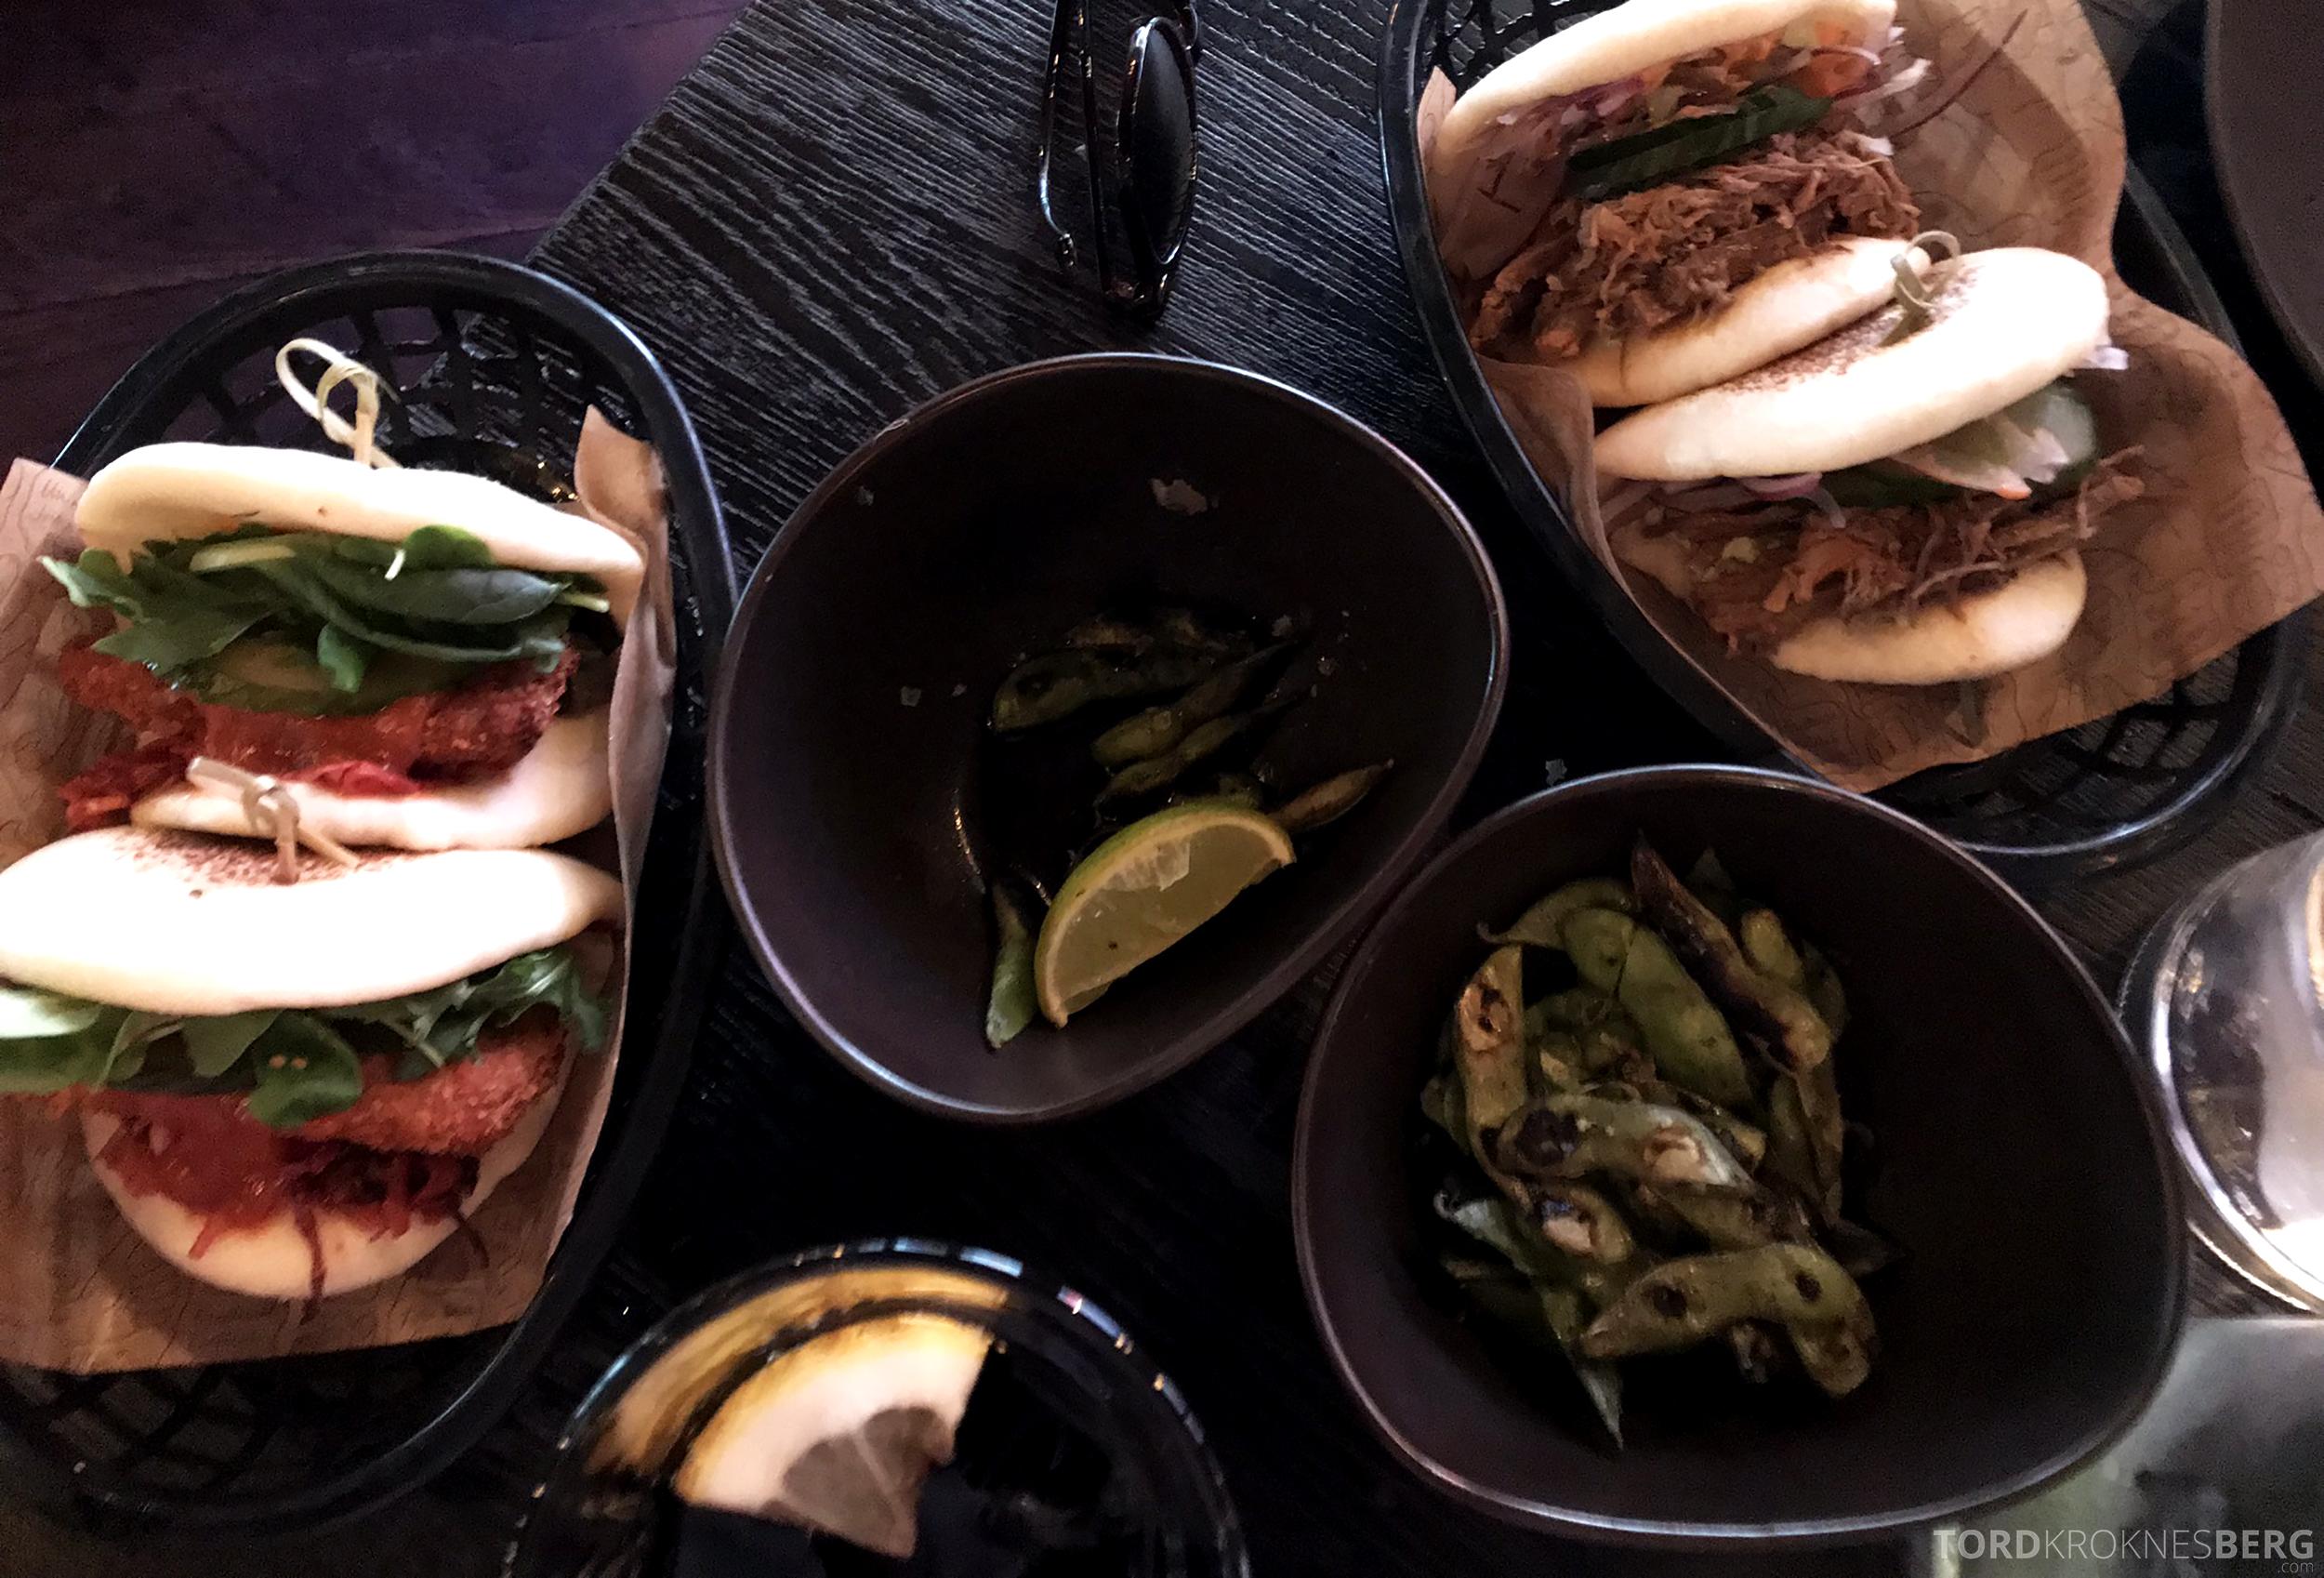 Restaurant Asia Aker Brygge Oslo sandwich